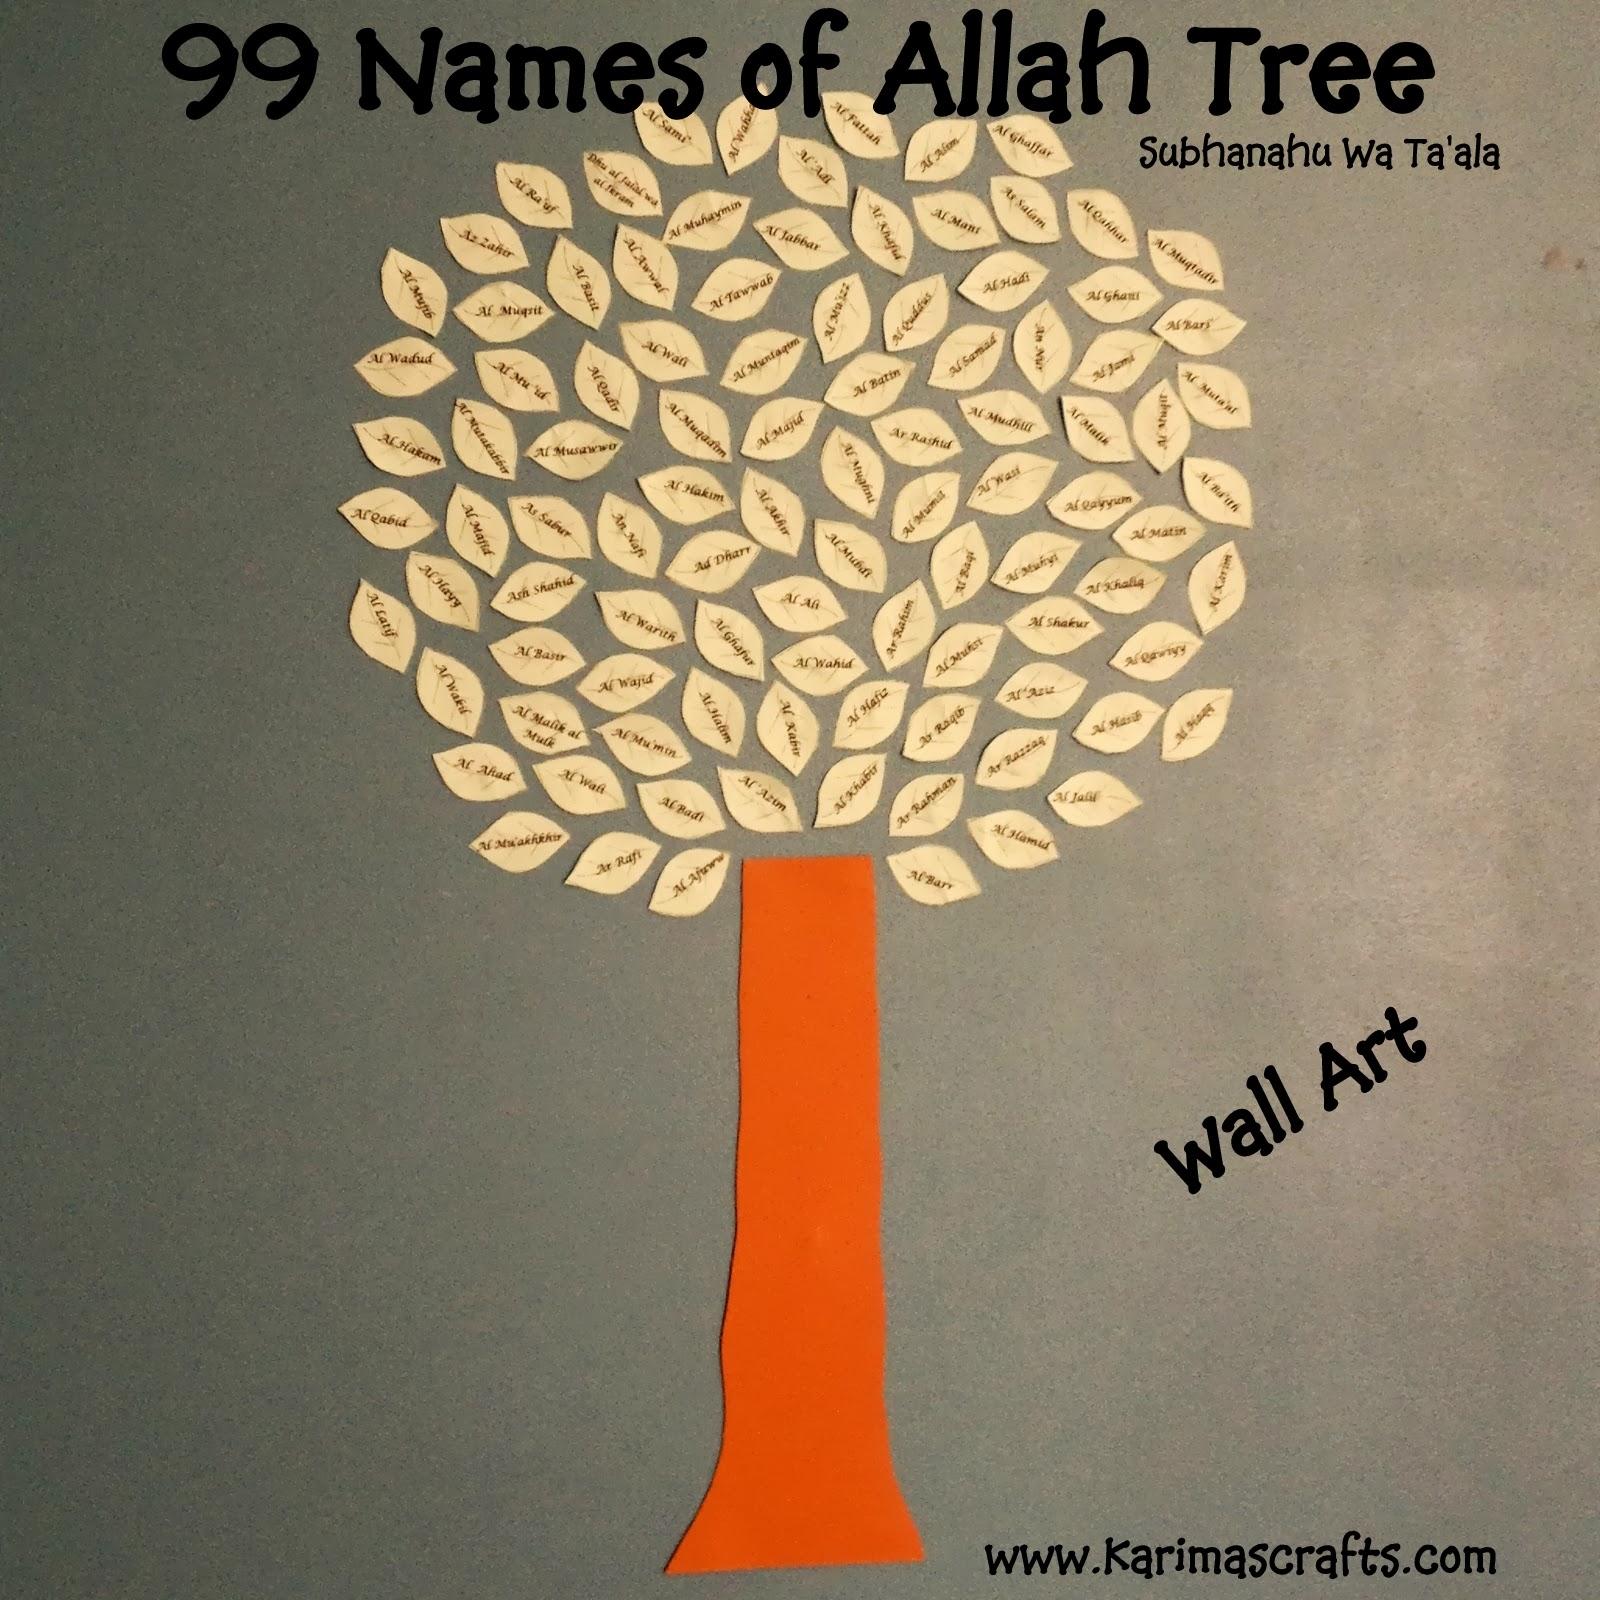 Karima S Crafts 99 Names Of Allah Tree